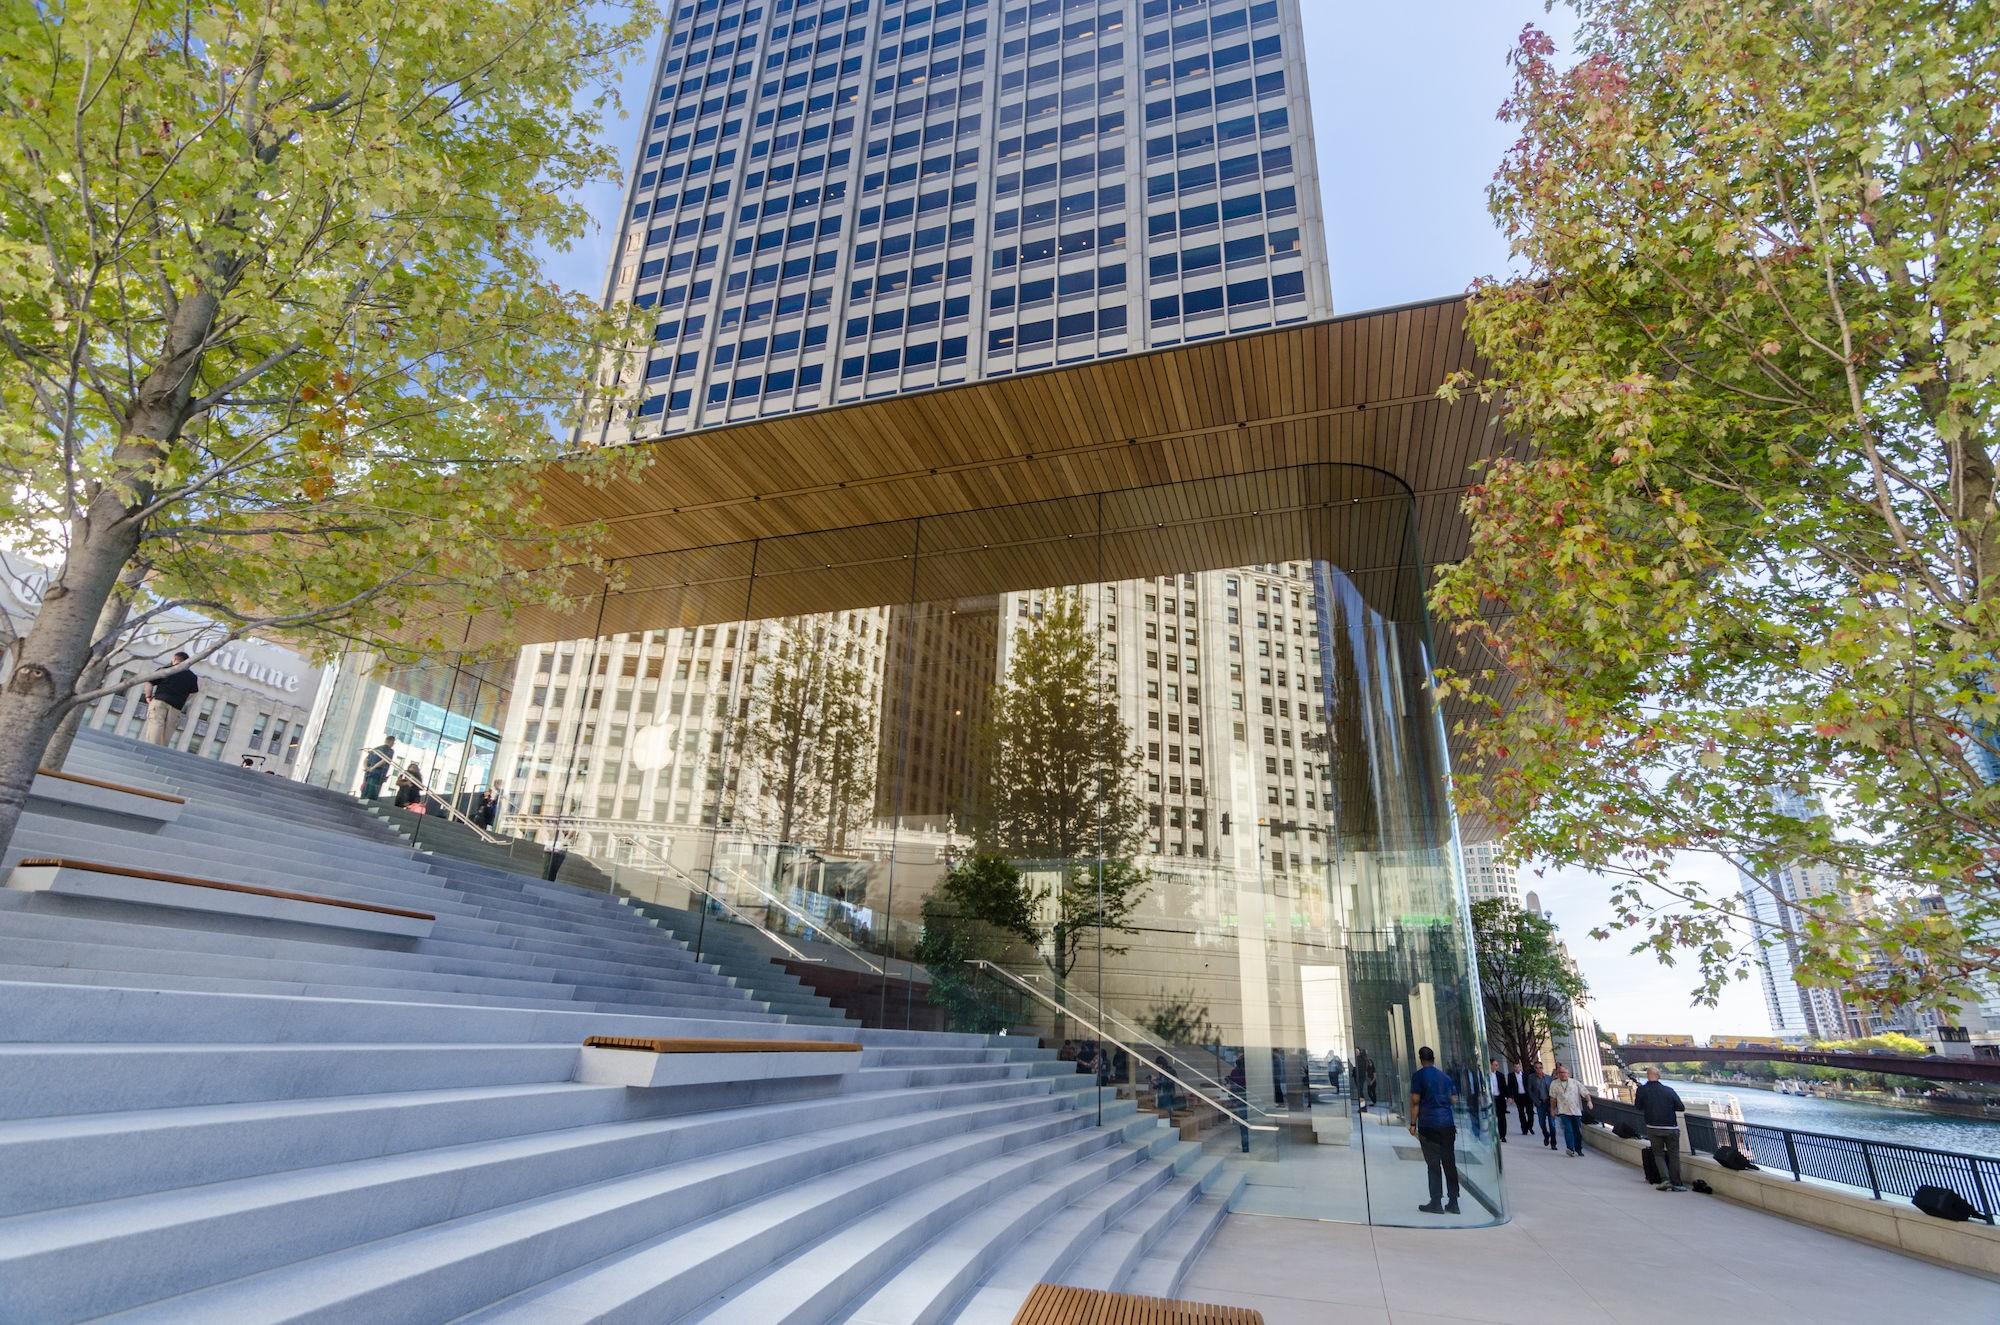 Apple Michigan Avenue Buildings Of Chicago Chicago Architecture Center Cac